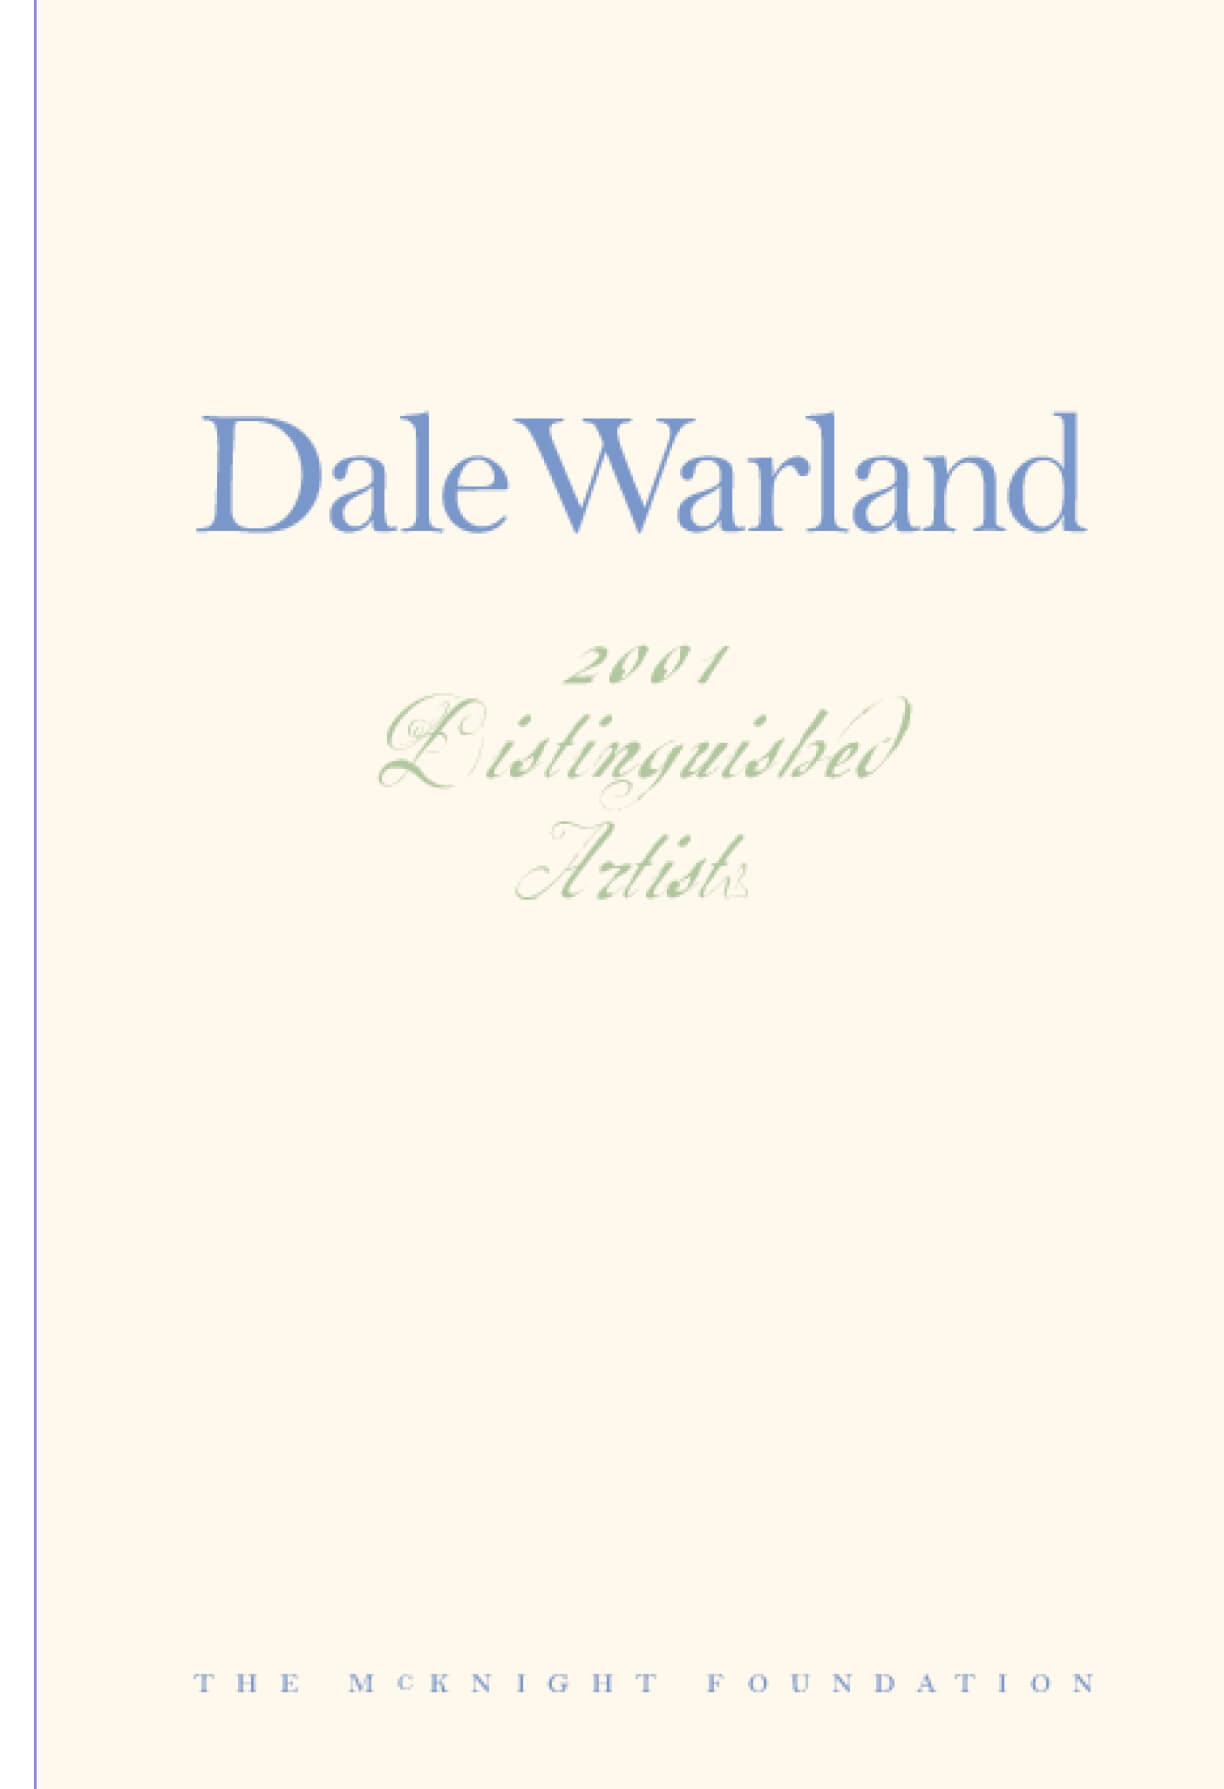 Dale Warland: 2001 McKnight Distinguished Artist